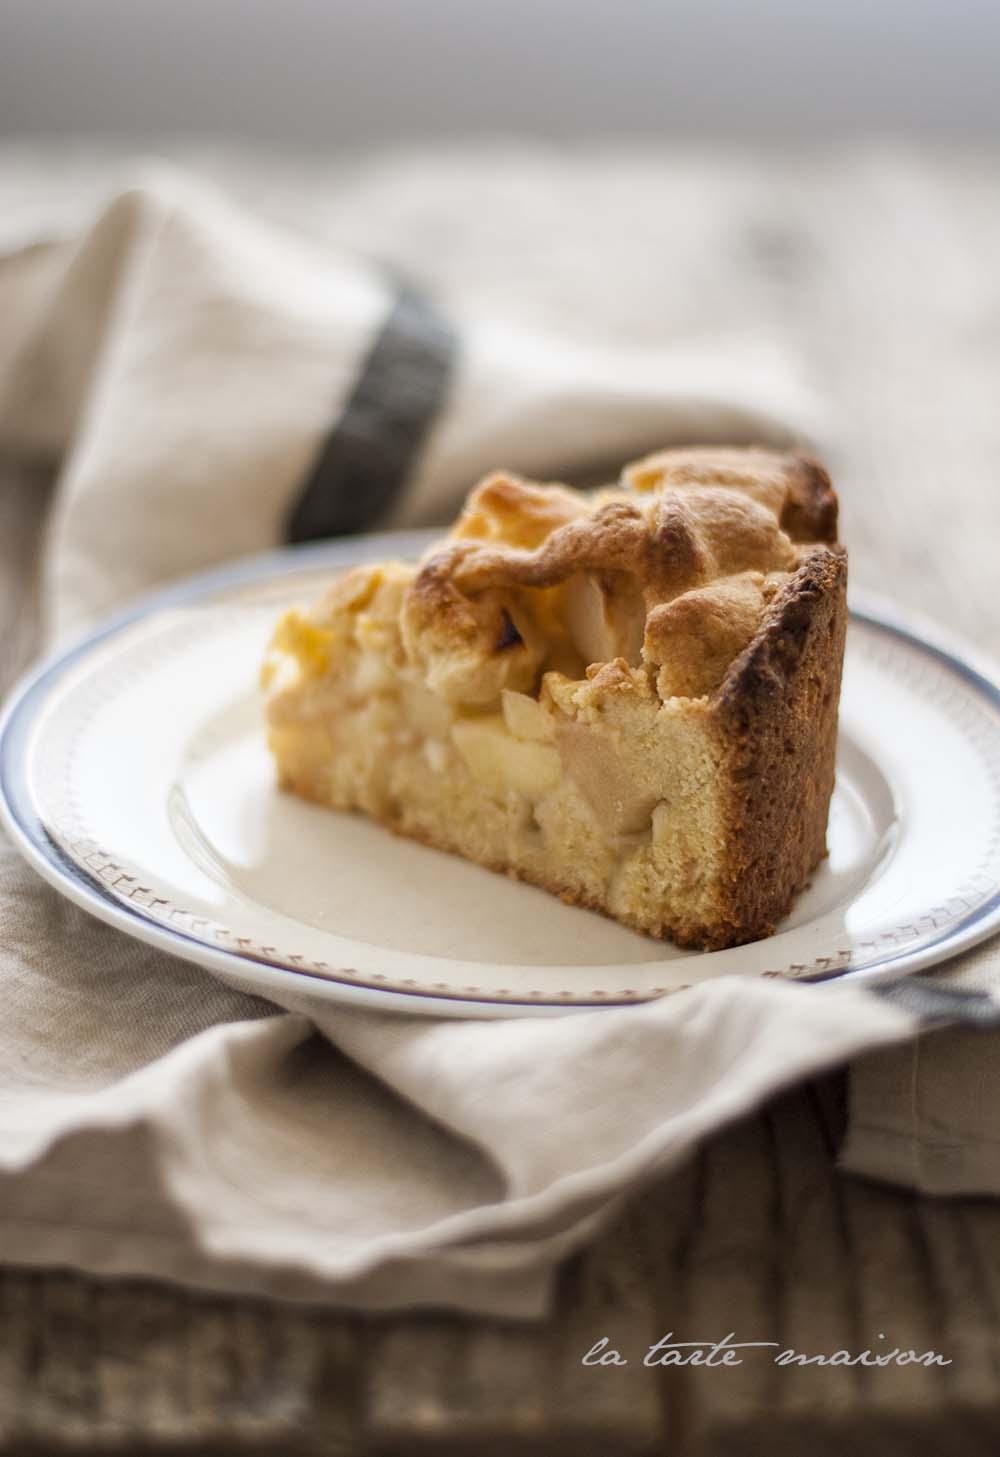 Crostata di mele l ennesima la tarte maison for Crostata di mele